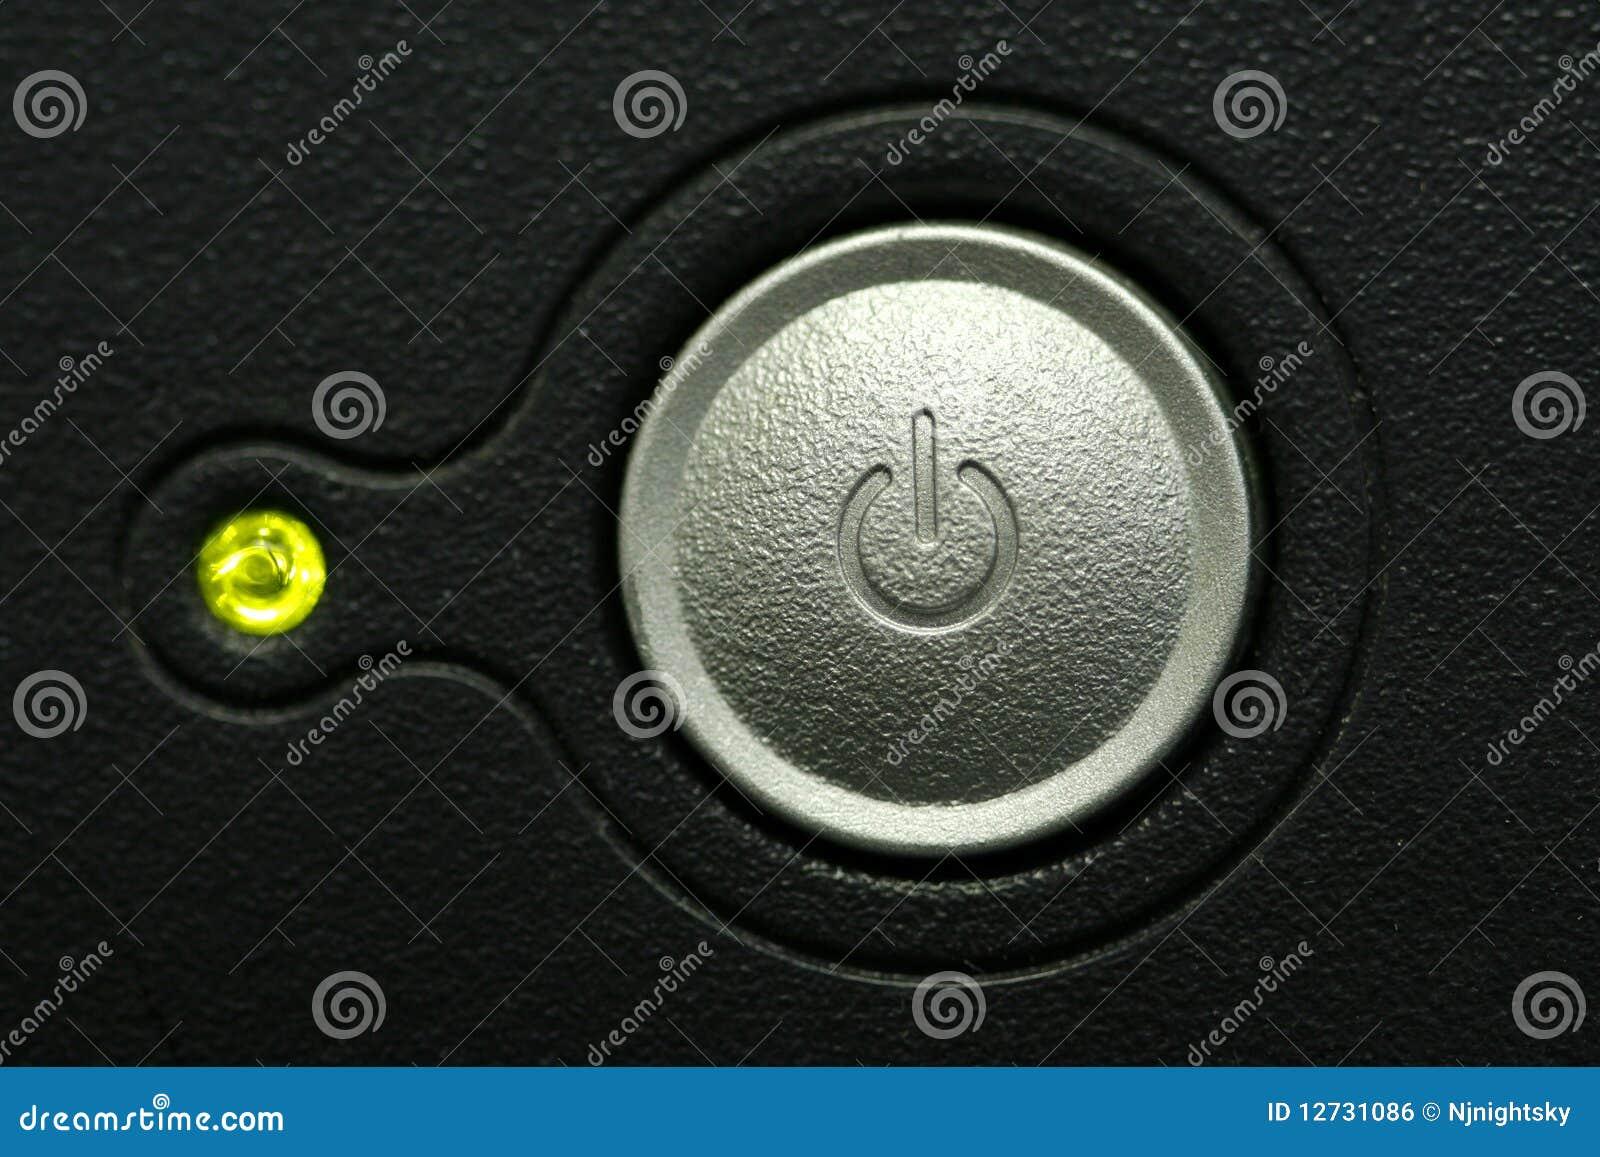 Monitor Power Button : Computer monitor power button macro stock photo image